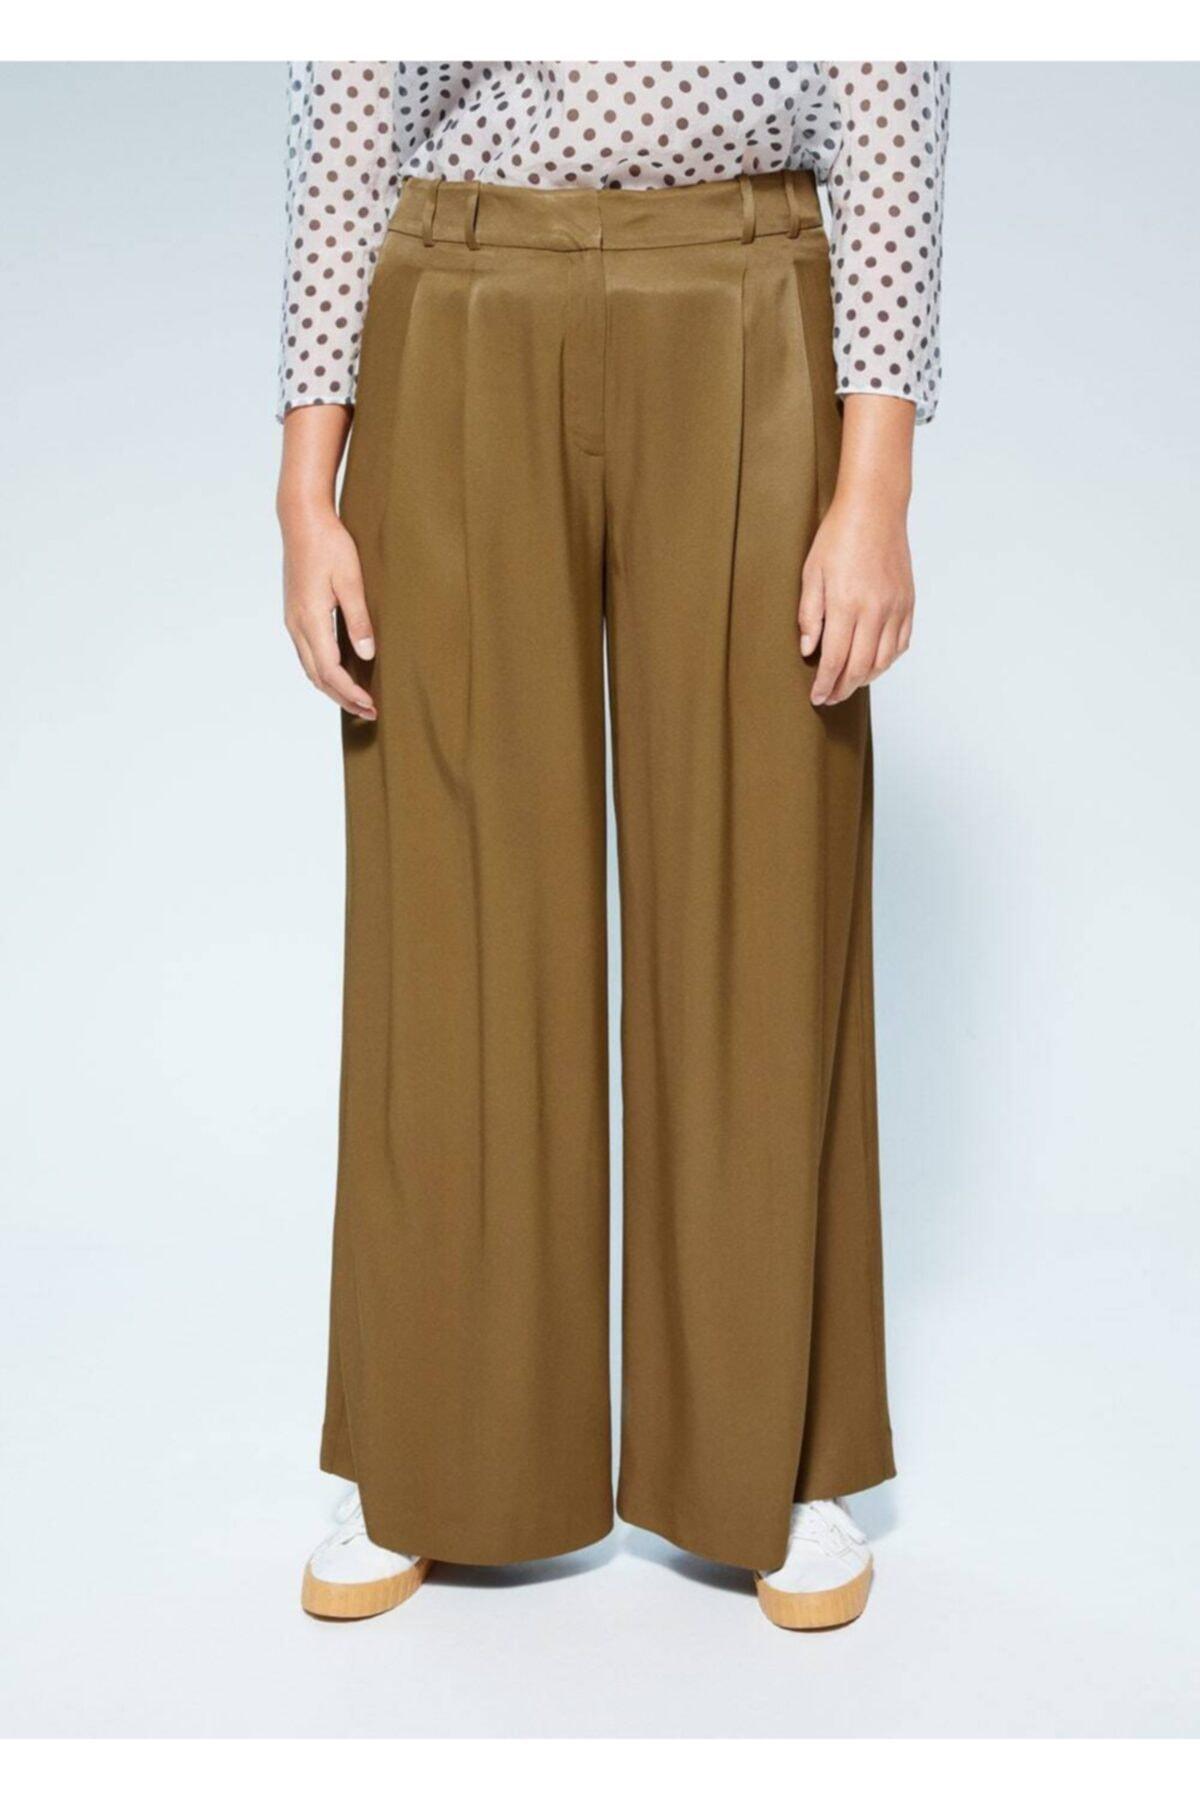 Violeta by MANGO Kadın Zeytin Yeşili Pili Detaylı Pantolon 67057885 2